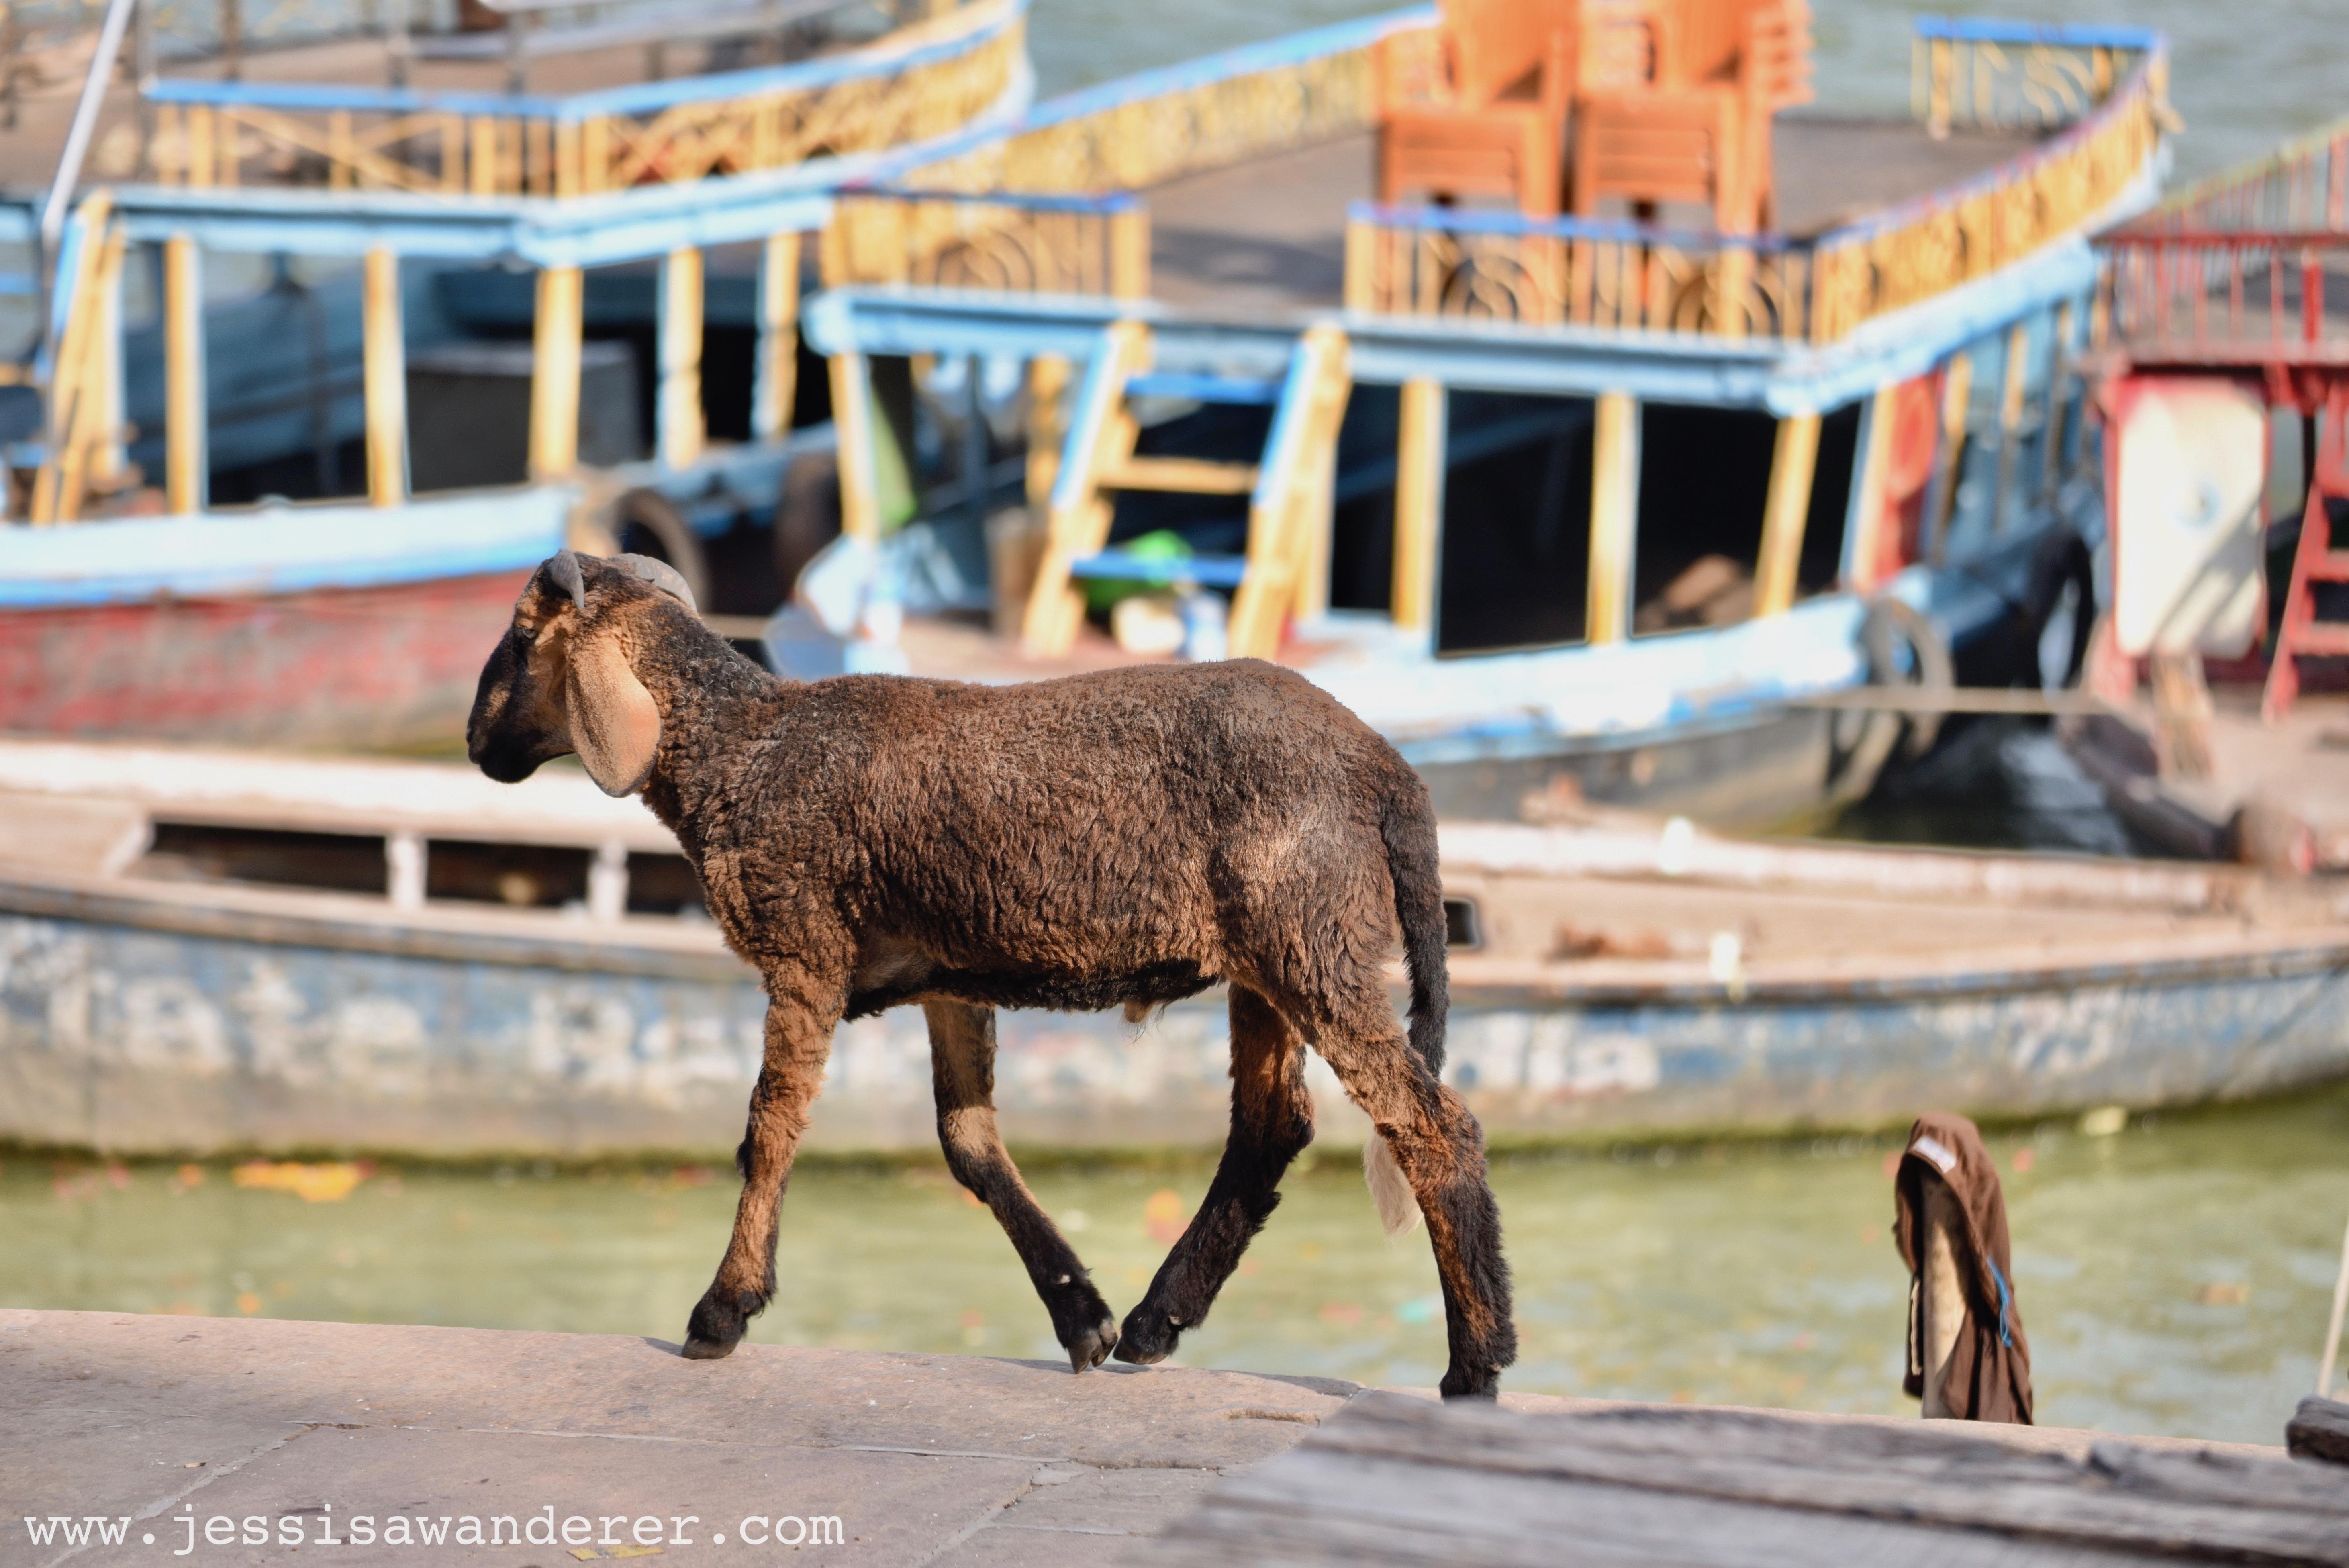 Goat on the move in Varanasi